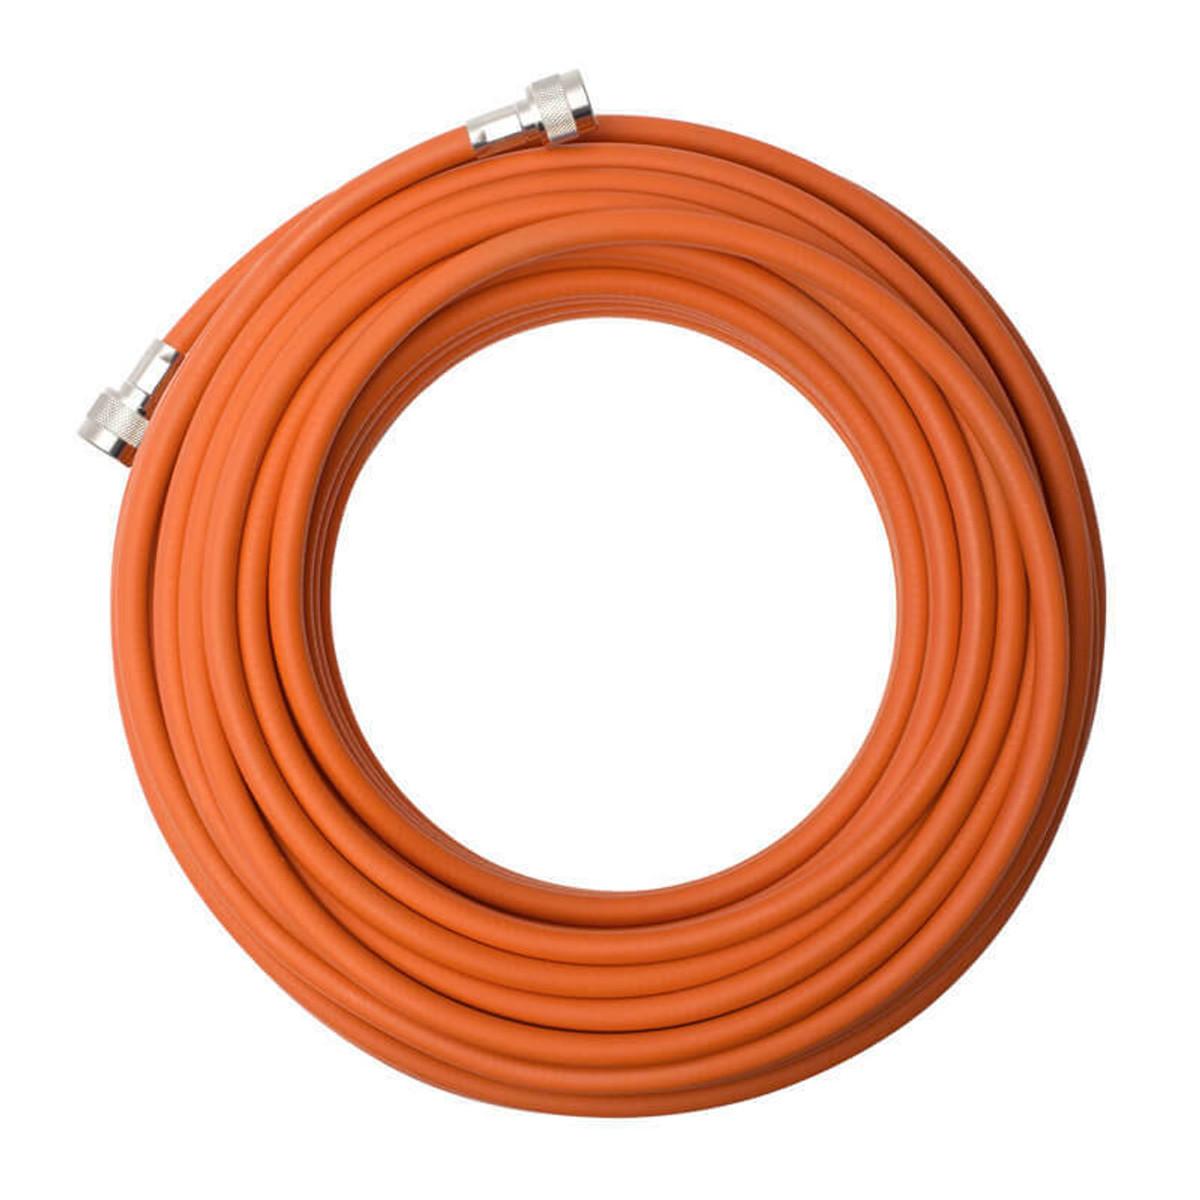 500 Ft Wilson 400 Low Loss Plenum Cable Spool (No Connectors)